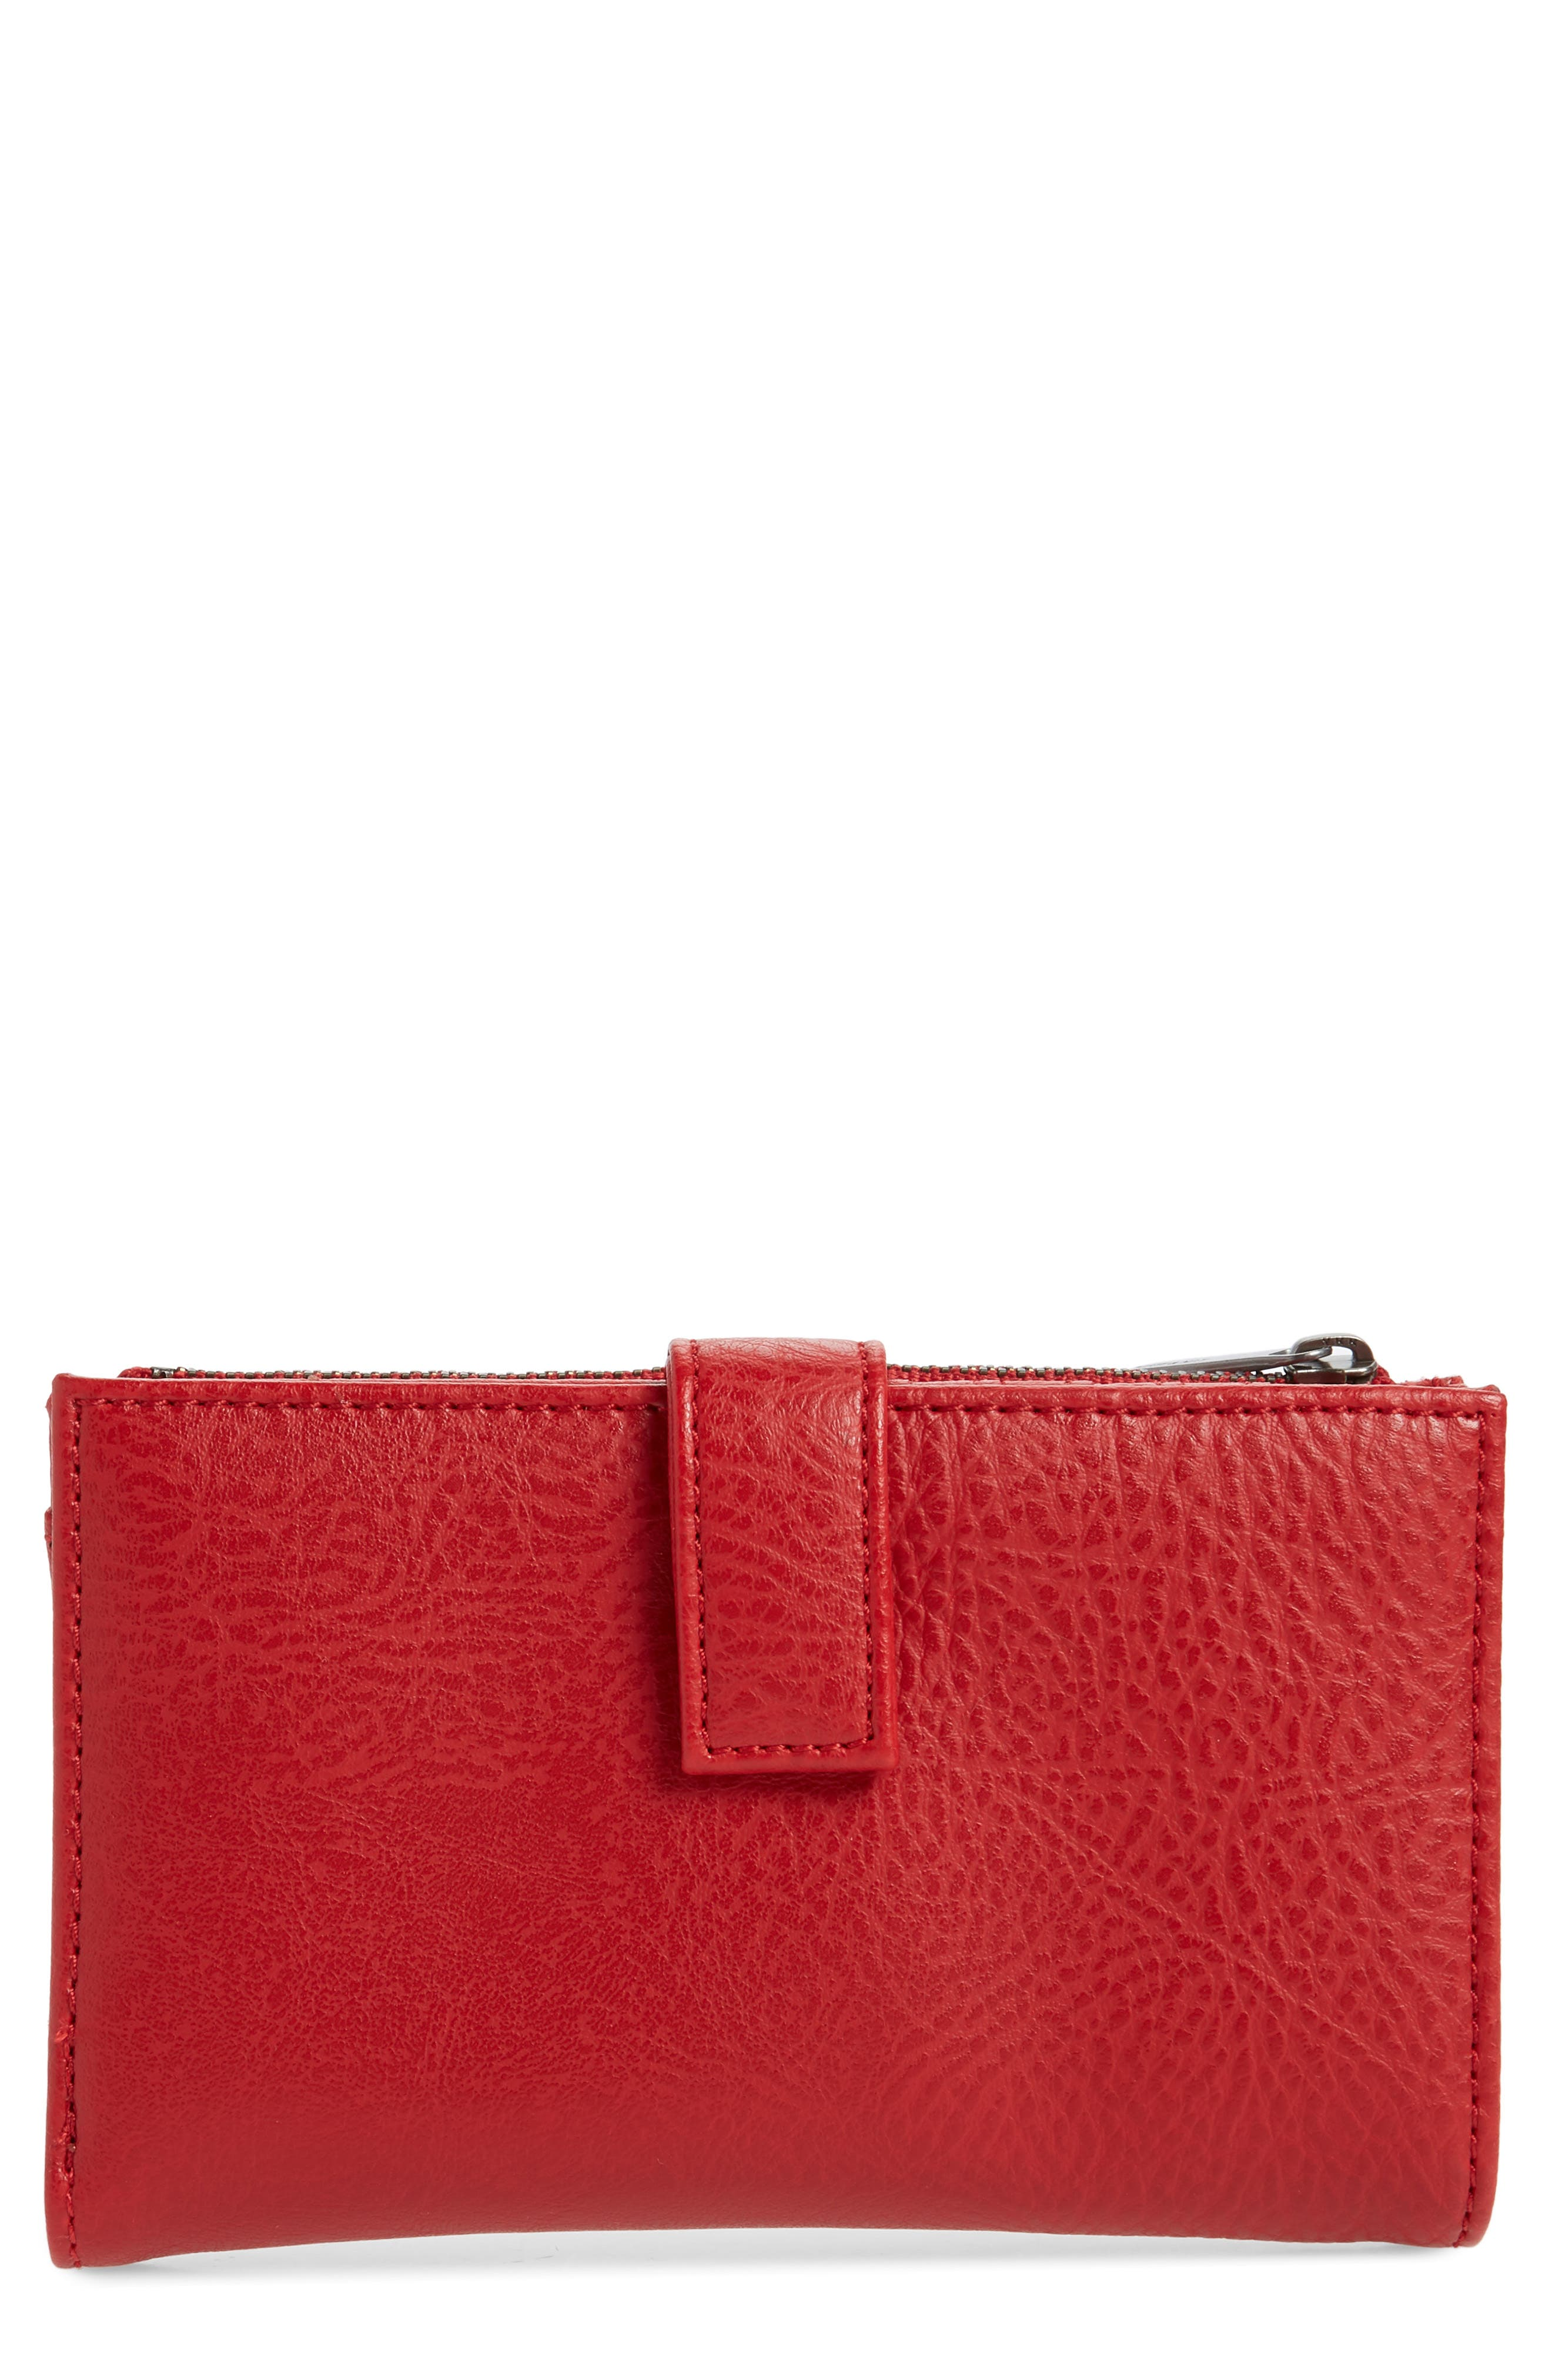 Matt & Nat Small Motiv Faux Leather Wallet - Red